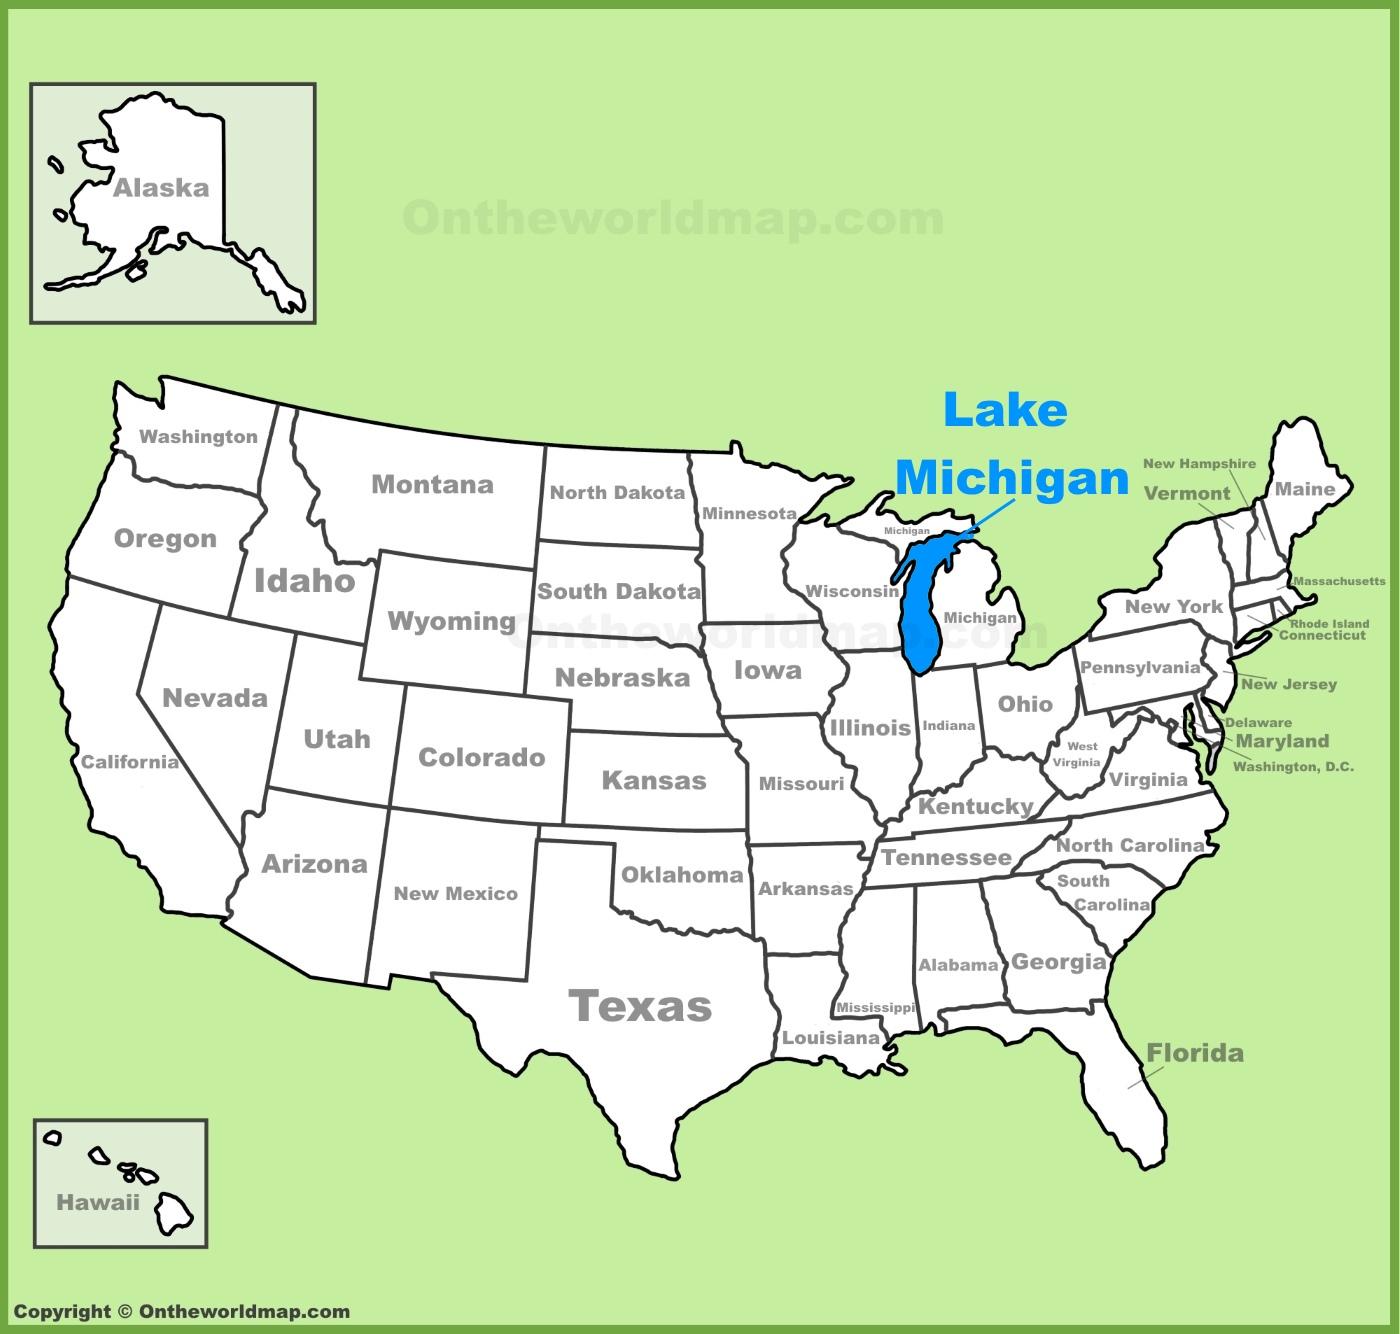 Michigan On Us Map Lake Michigan location on the U.S. Map Michigan On Us Map